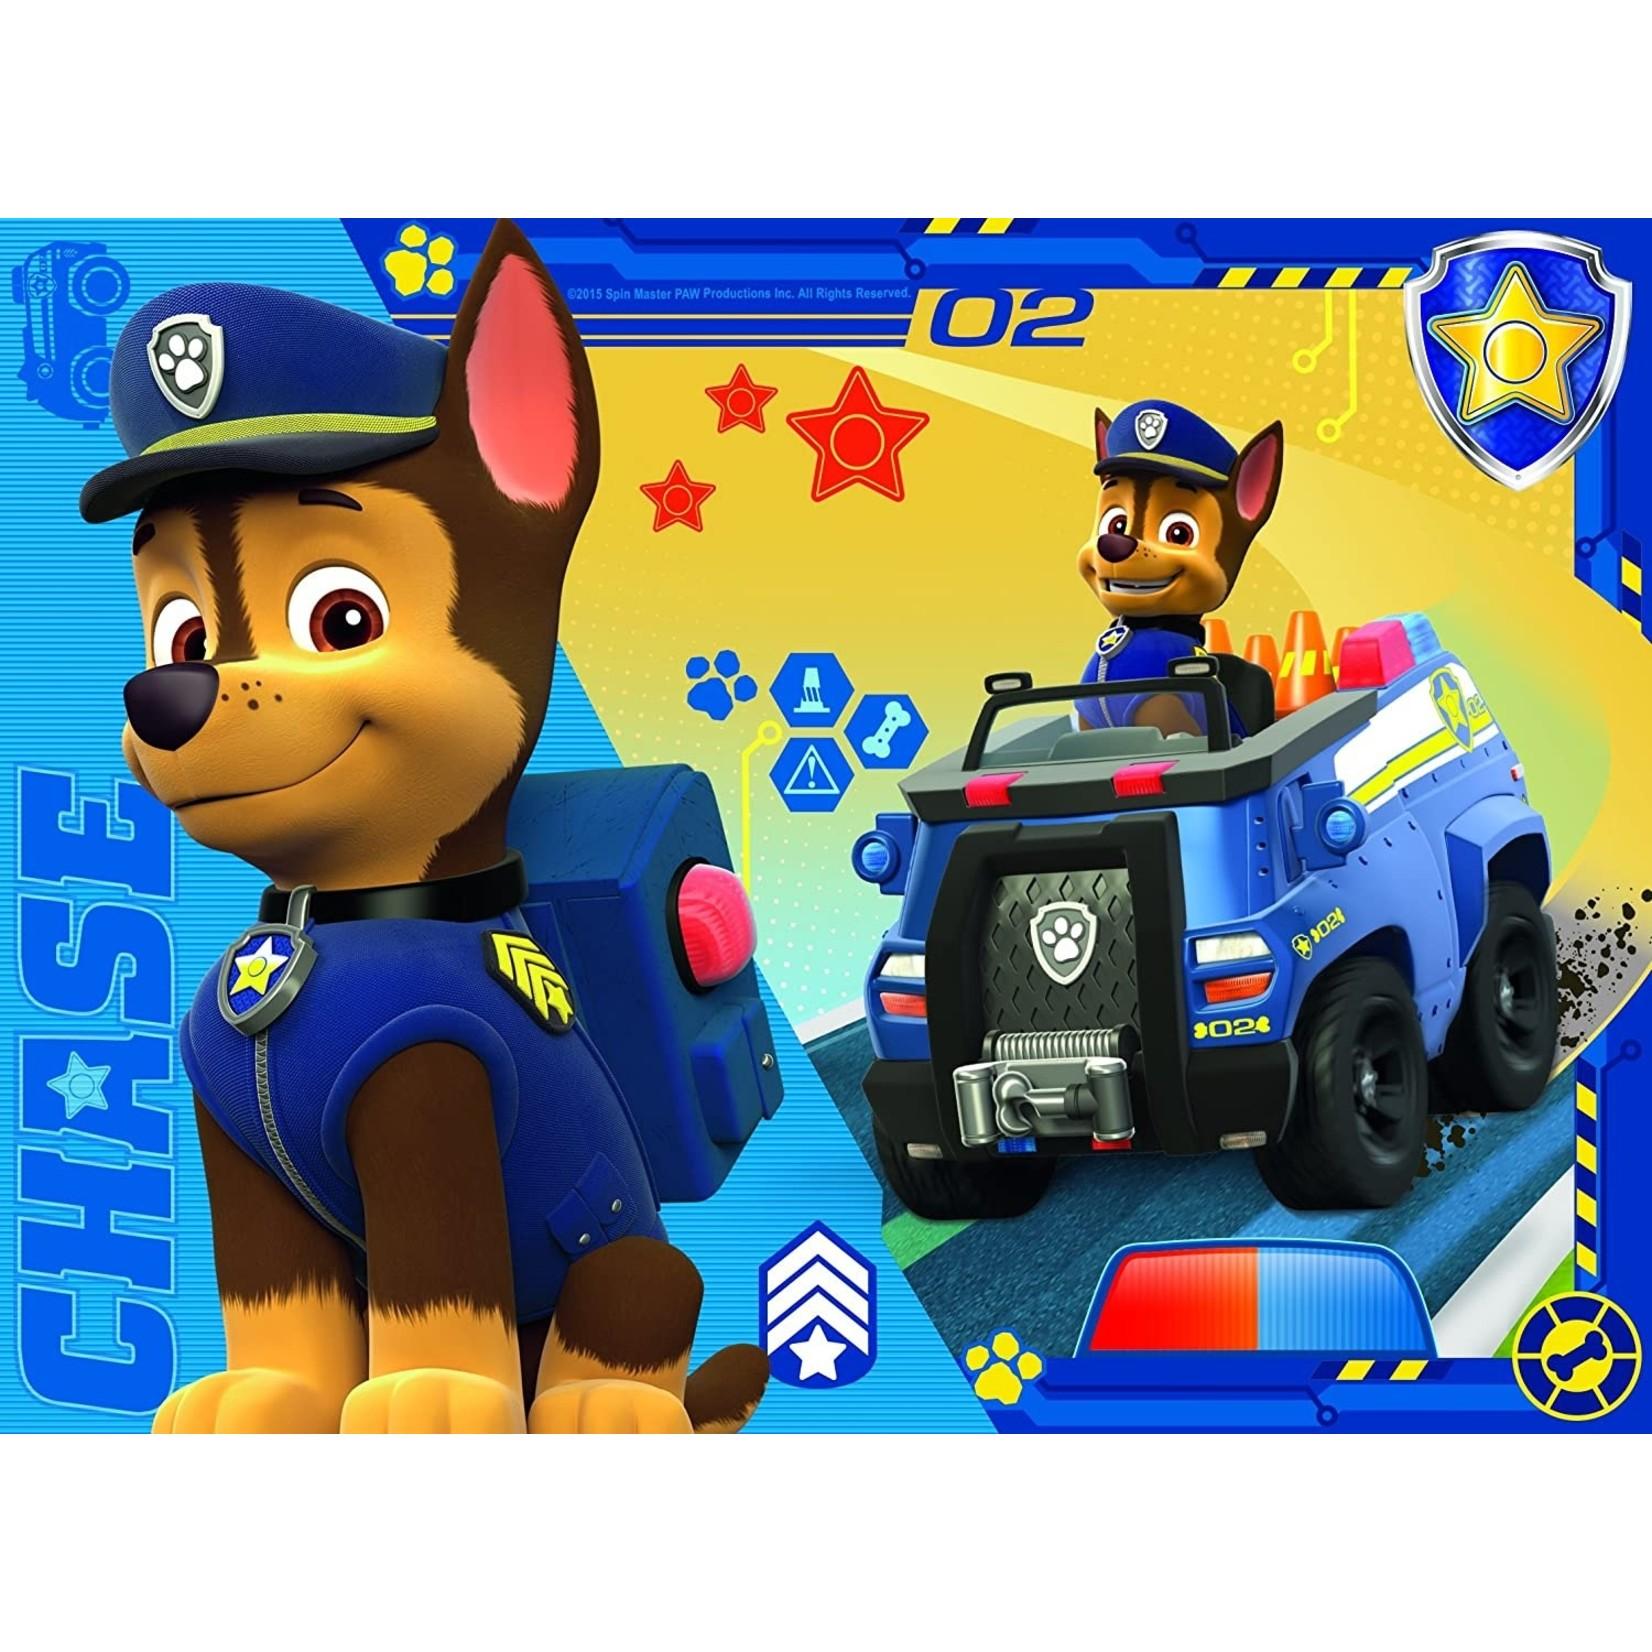 Ravensburger PAW Patrol 4 in 1 Puzzle Ravensburger